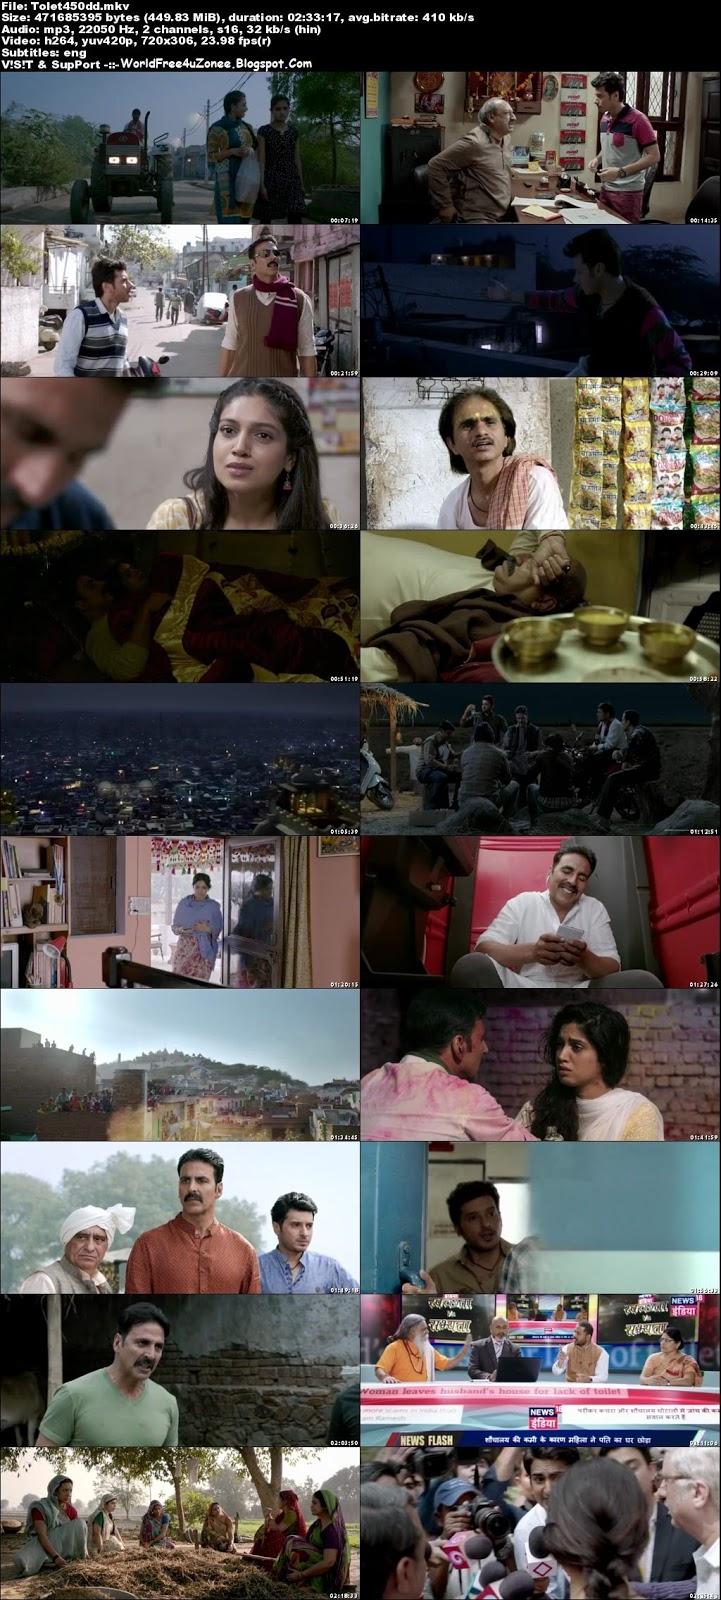 Toilet Ek Prem Katha (2017) Hindi DVDRip 480p 450MB Full Movie Free Download And Watch Online Latest Bollywood Hindi Movies 2017 Free At WorldFree4uZonee.Blogspot.Com